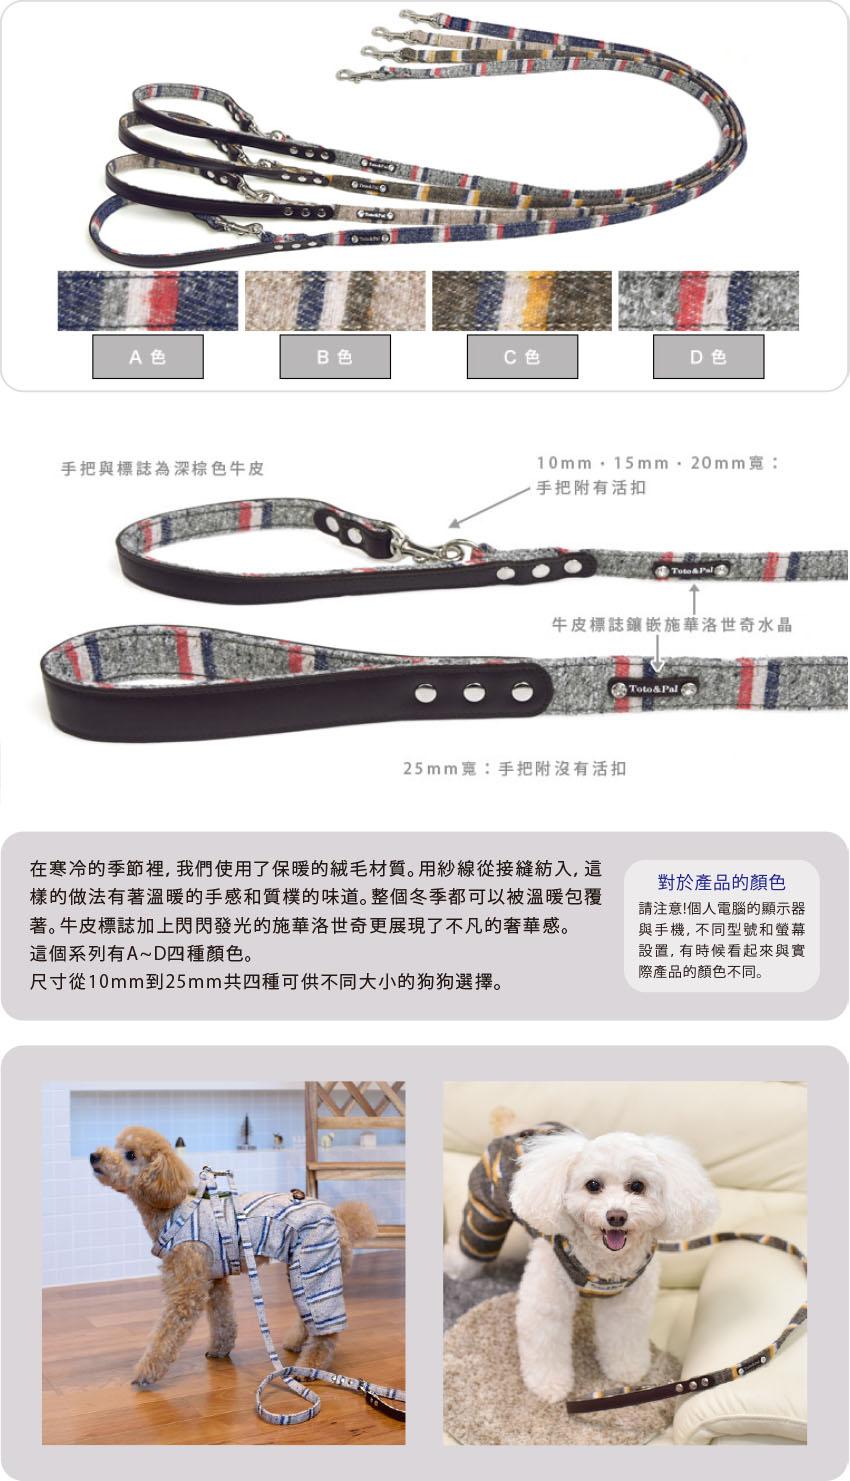 Toto&pal  NEP BORDER系列 牽繩 100% 日本製作 100%純棉 寵物外出用品第一選擇